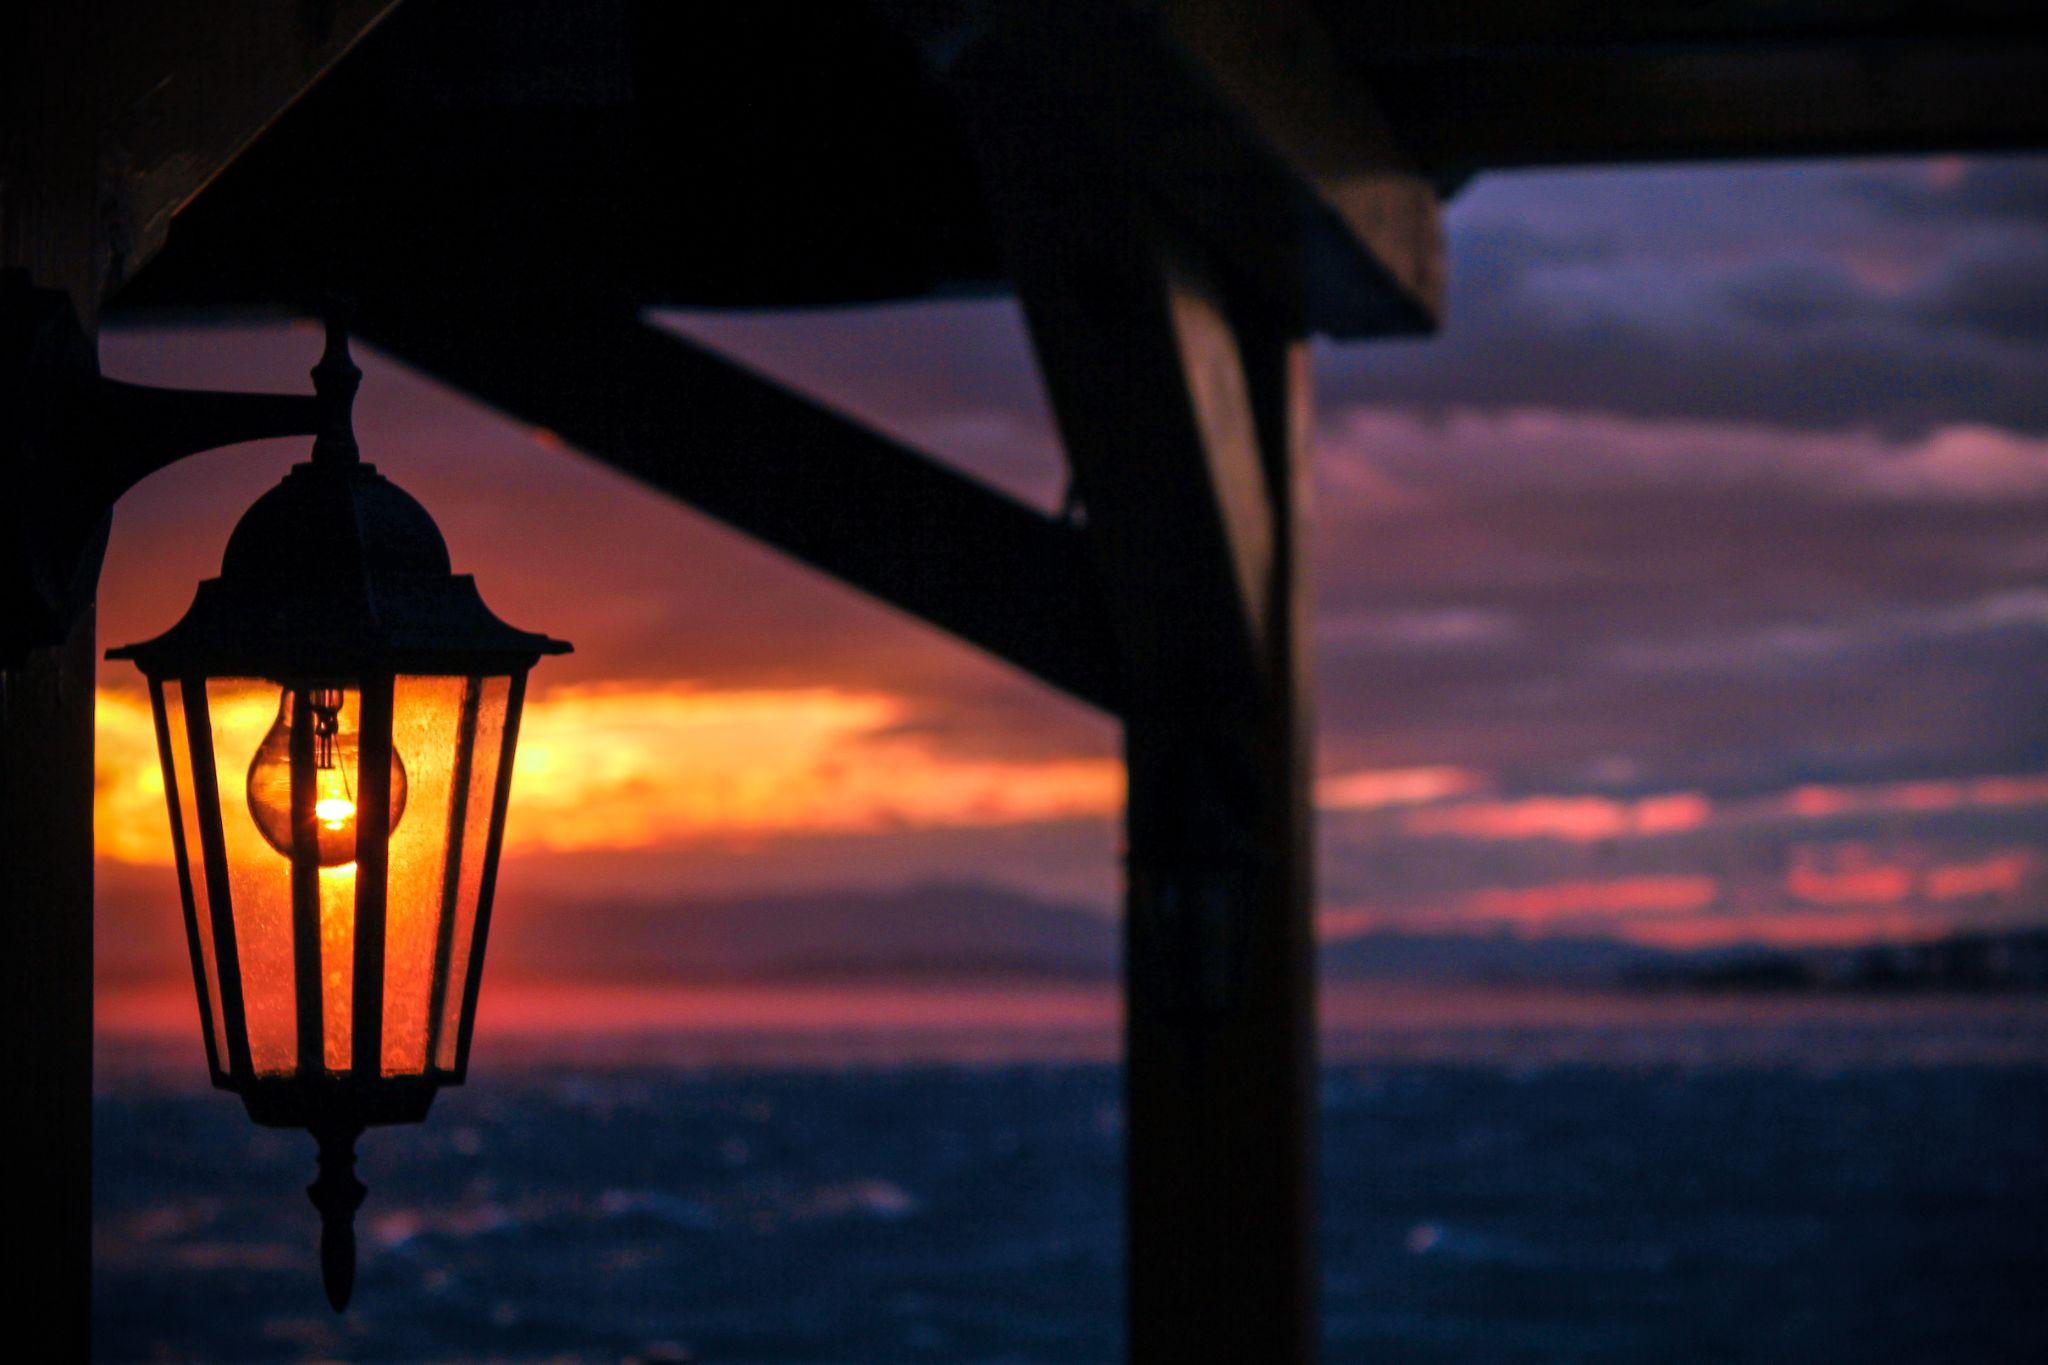 Light Bulb Sunset by Matej Paluh